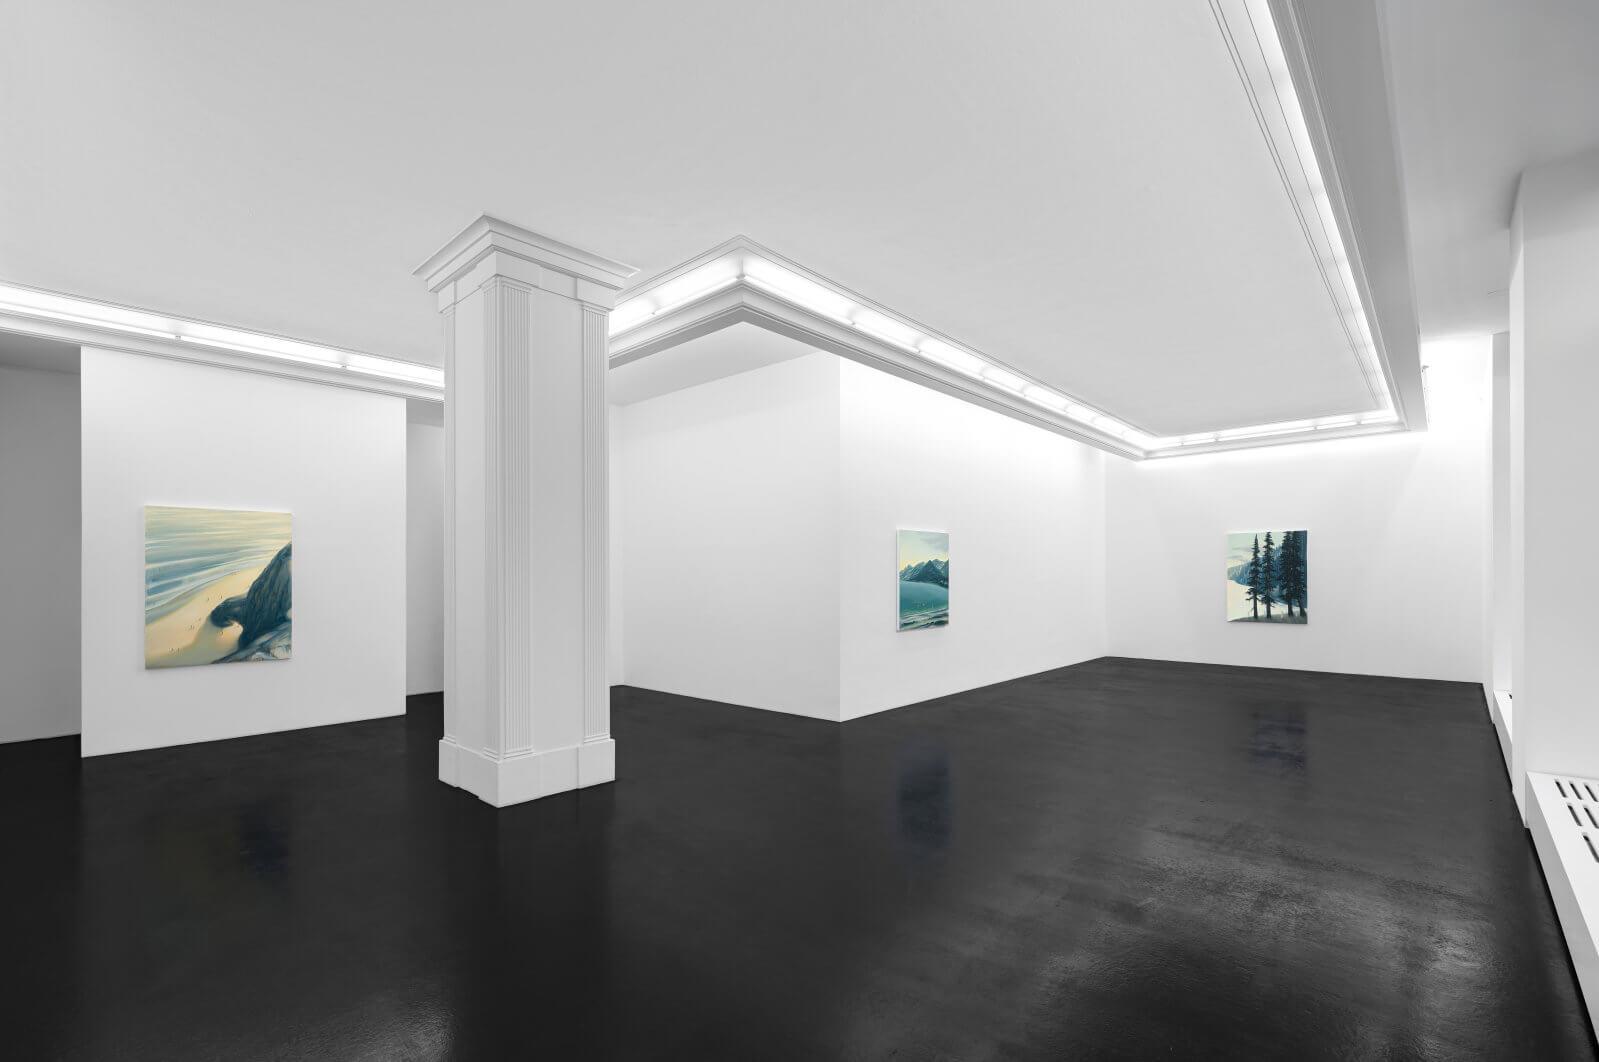 DA-Natural-Selections-Installation-View-8-HIRES-1600x1062.jpg